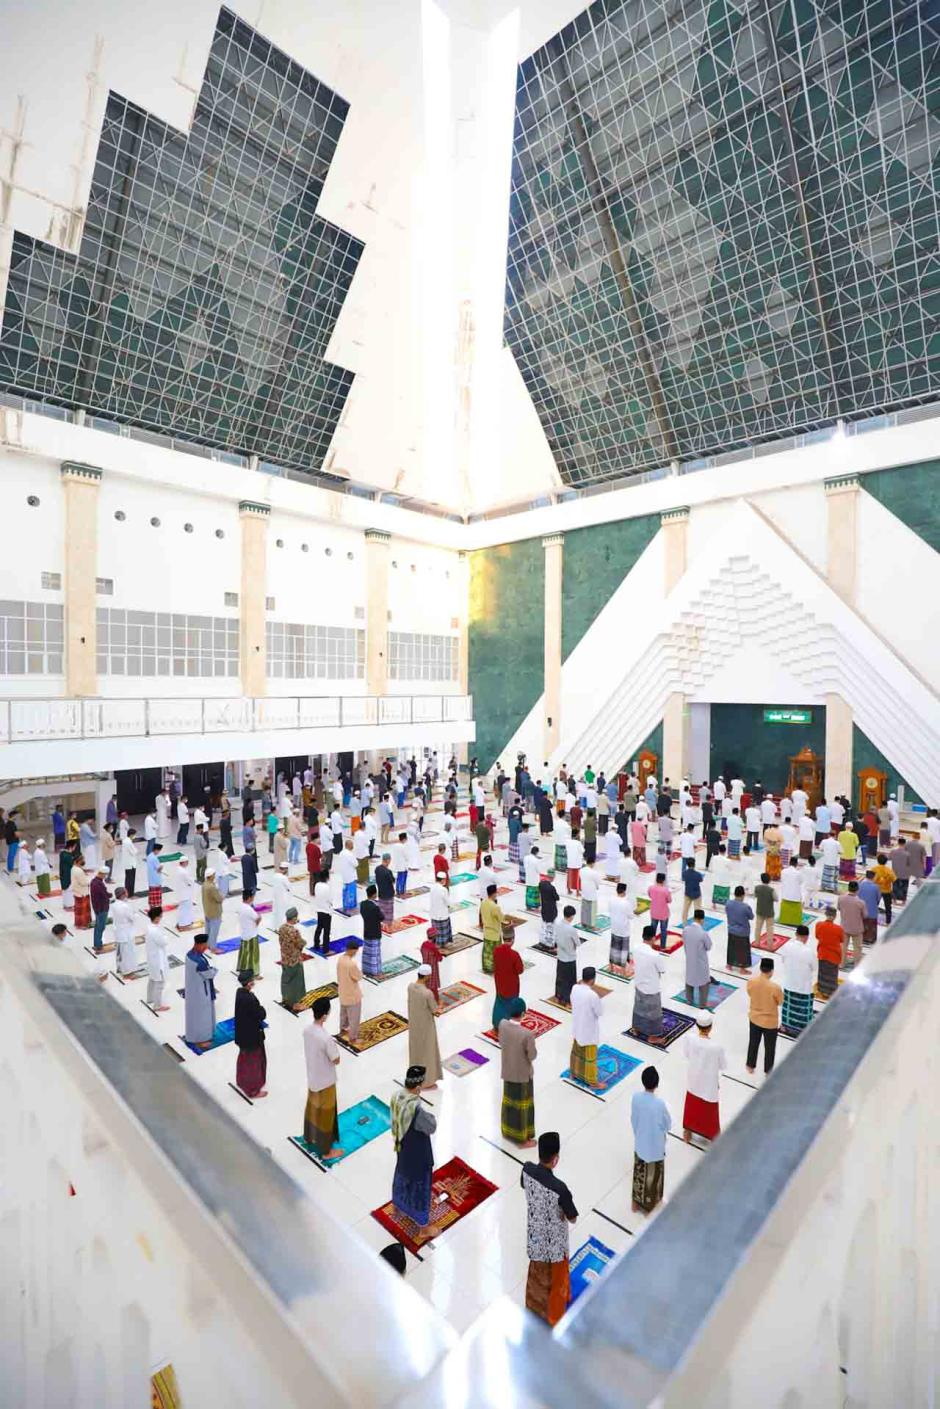 Sholat Idul Fitri di Masjid Raya Kyai Haji Hasyim Ashari-0